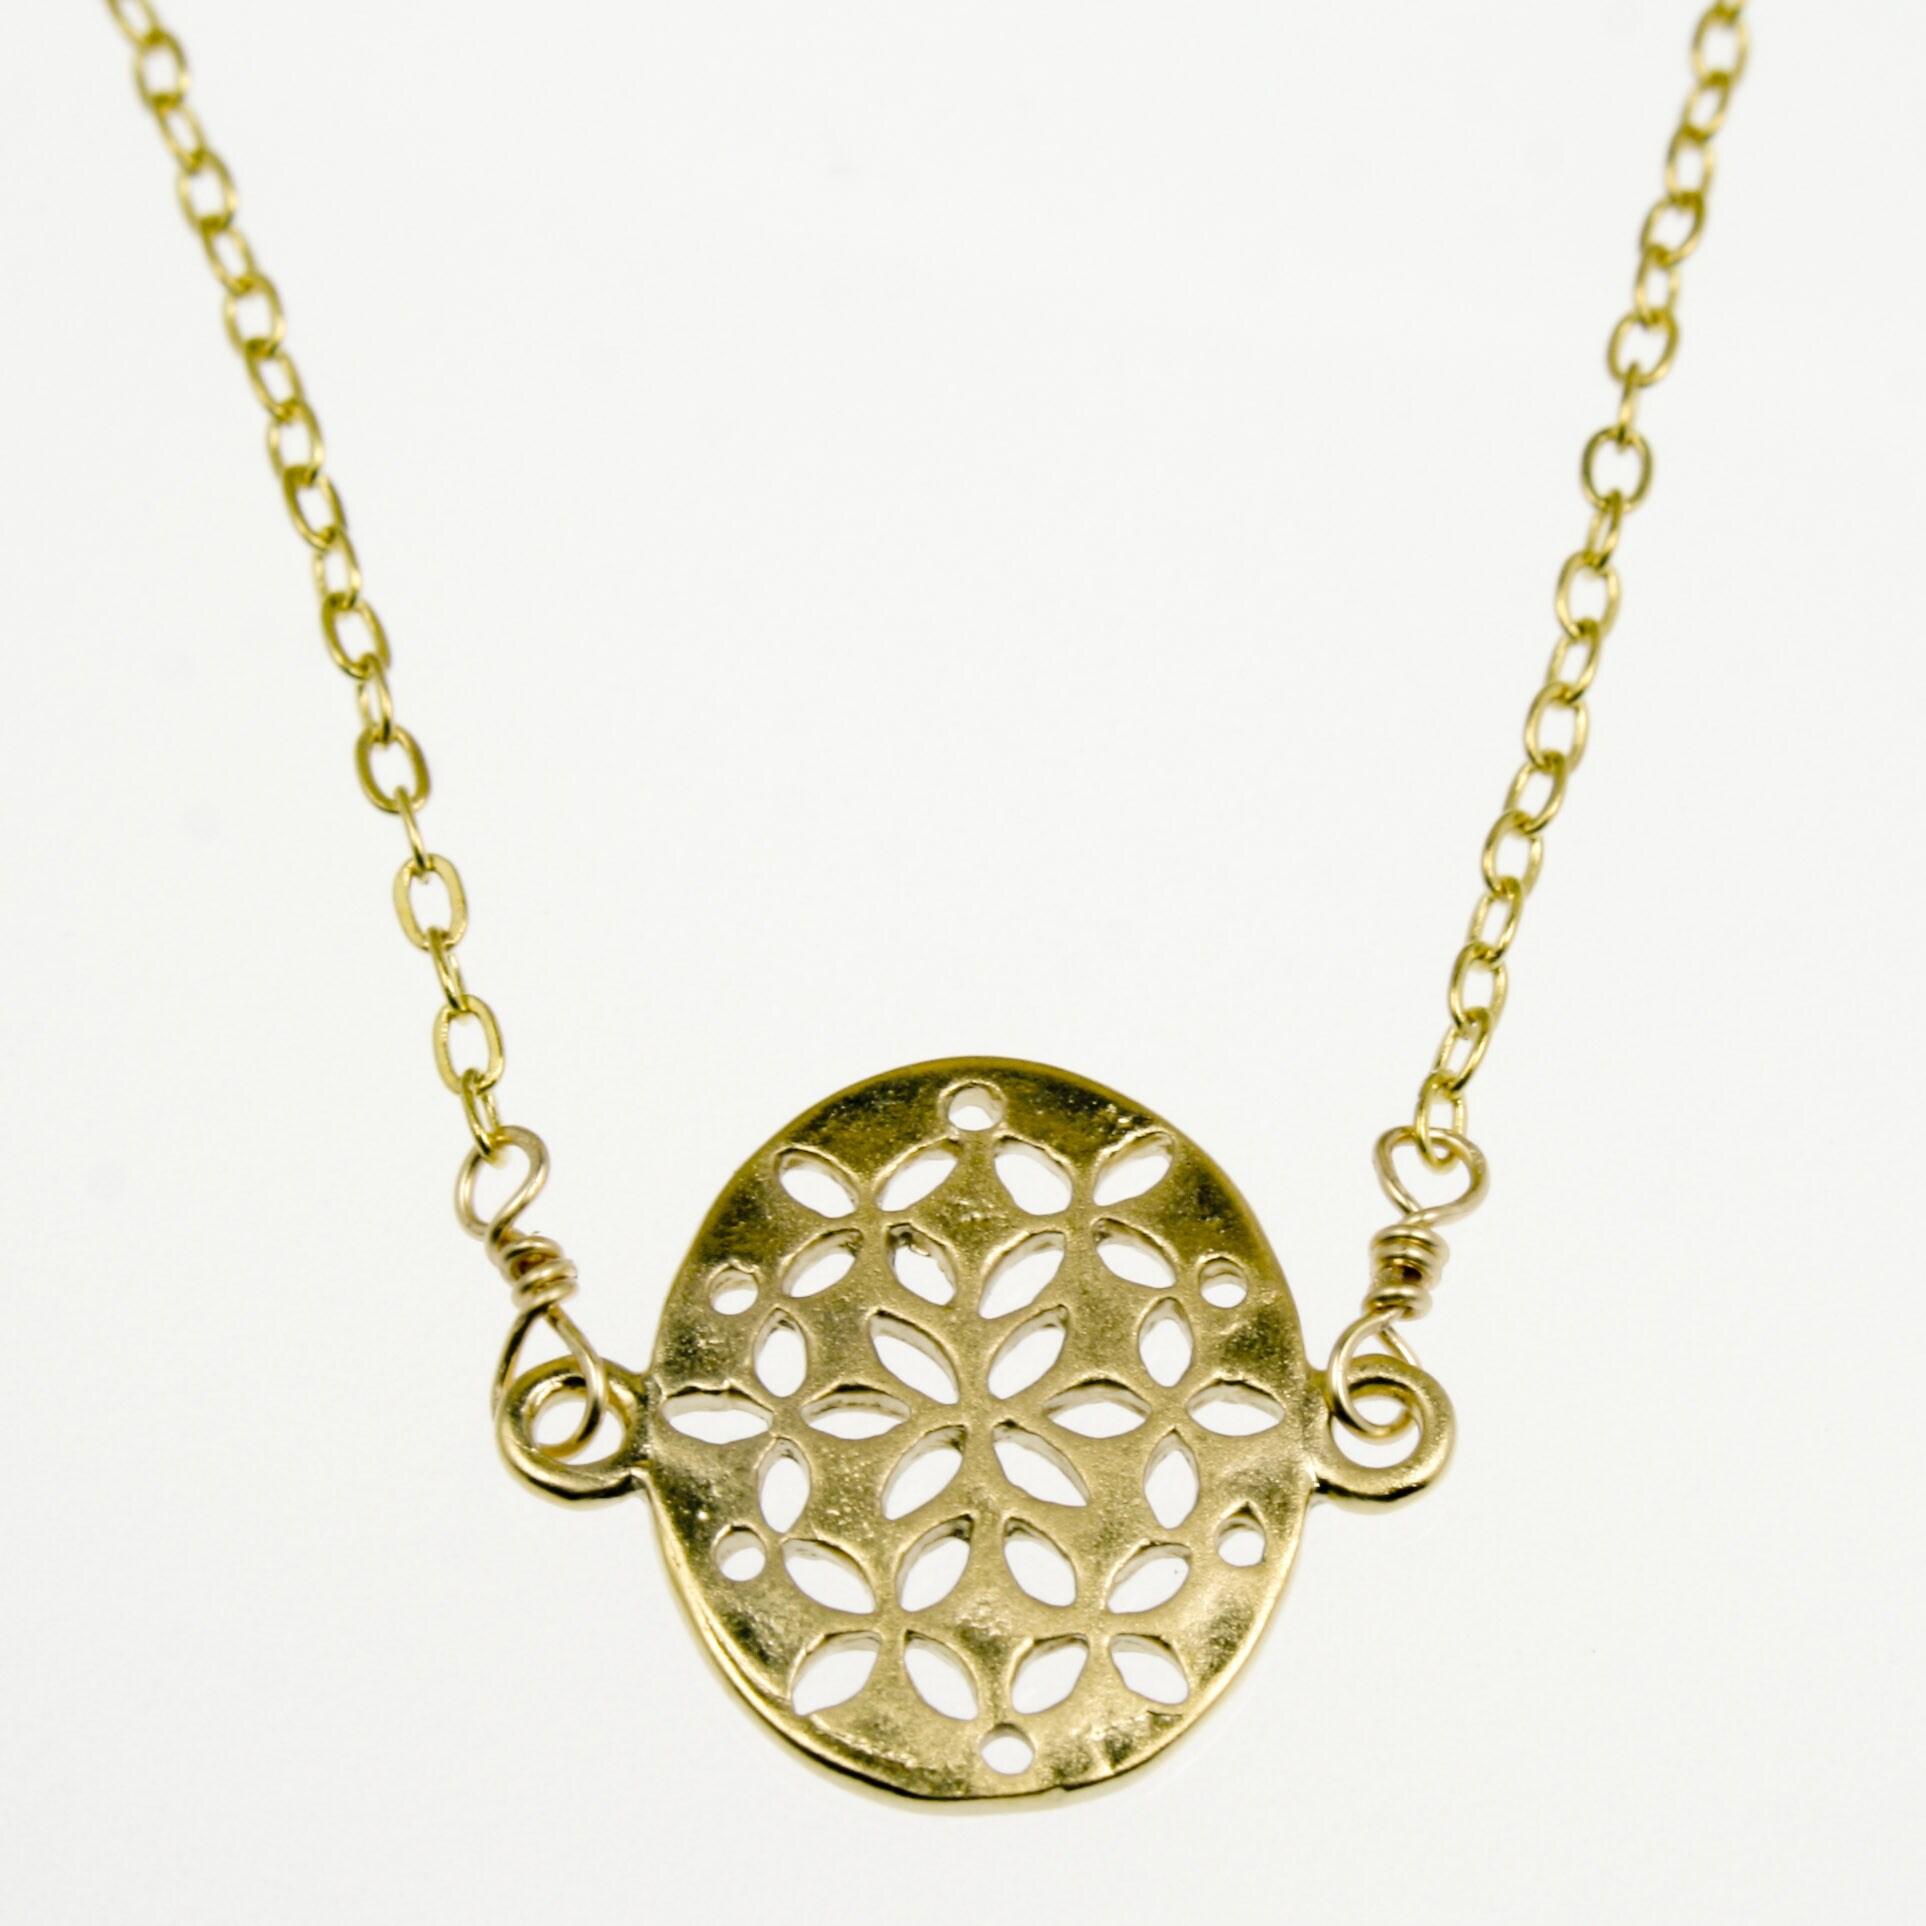 Flat Oval Filigree Pendant Necklace